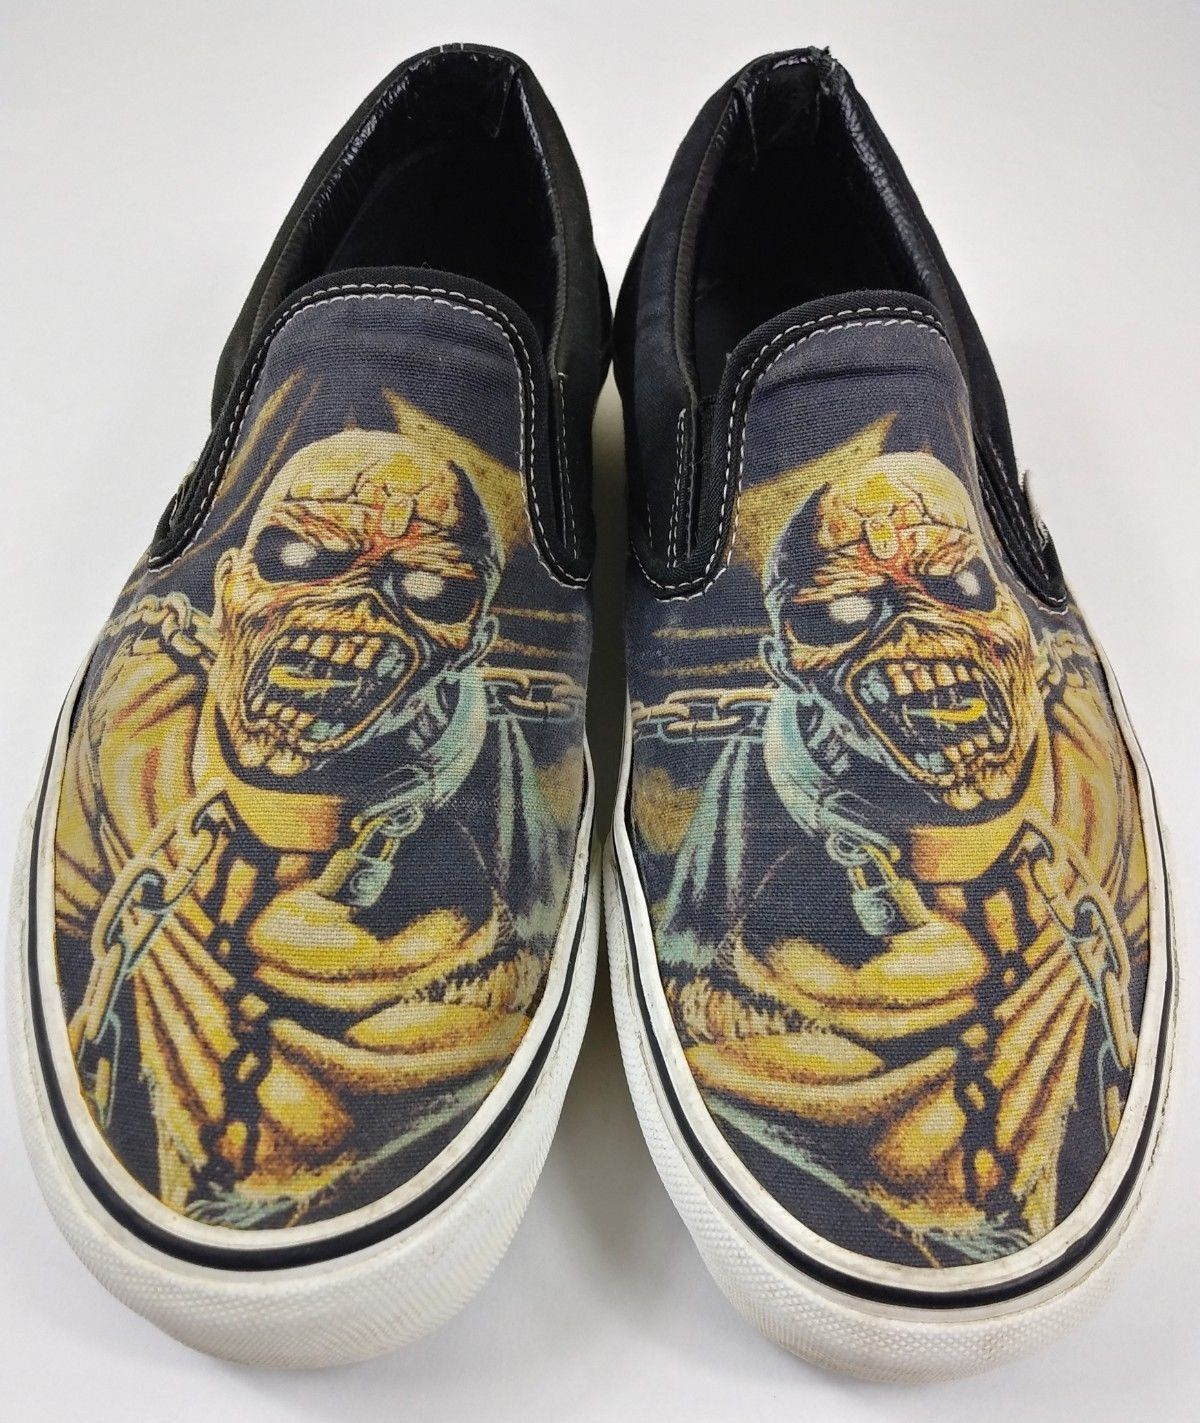 8e1b3afc32 Details about Vans Iron Maiden